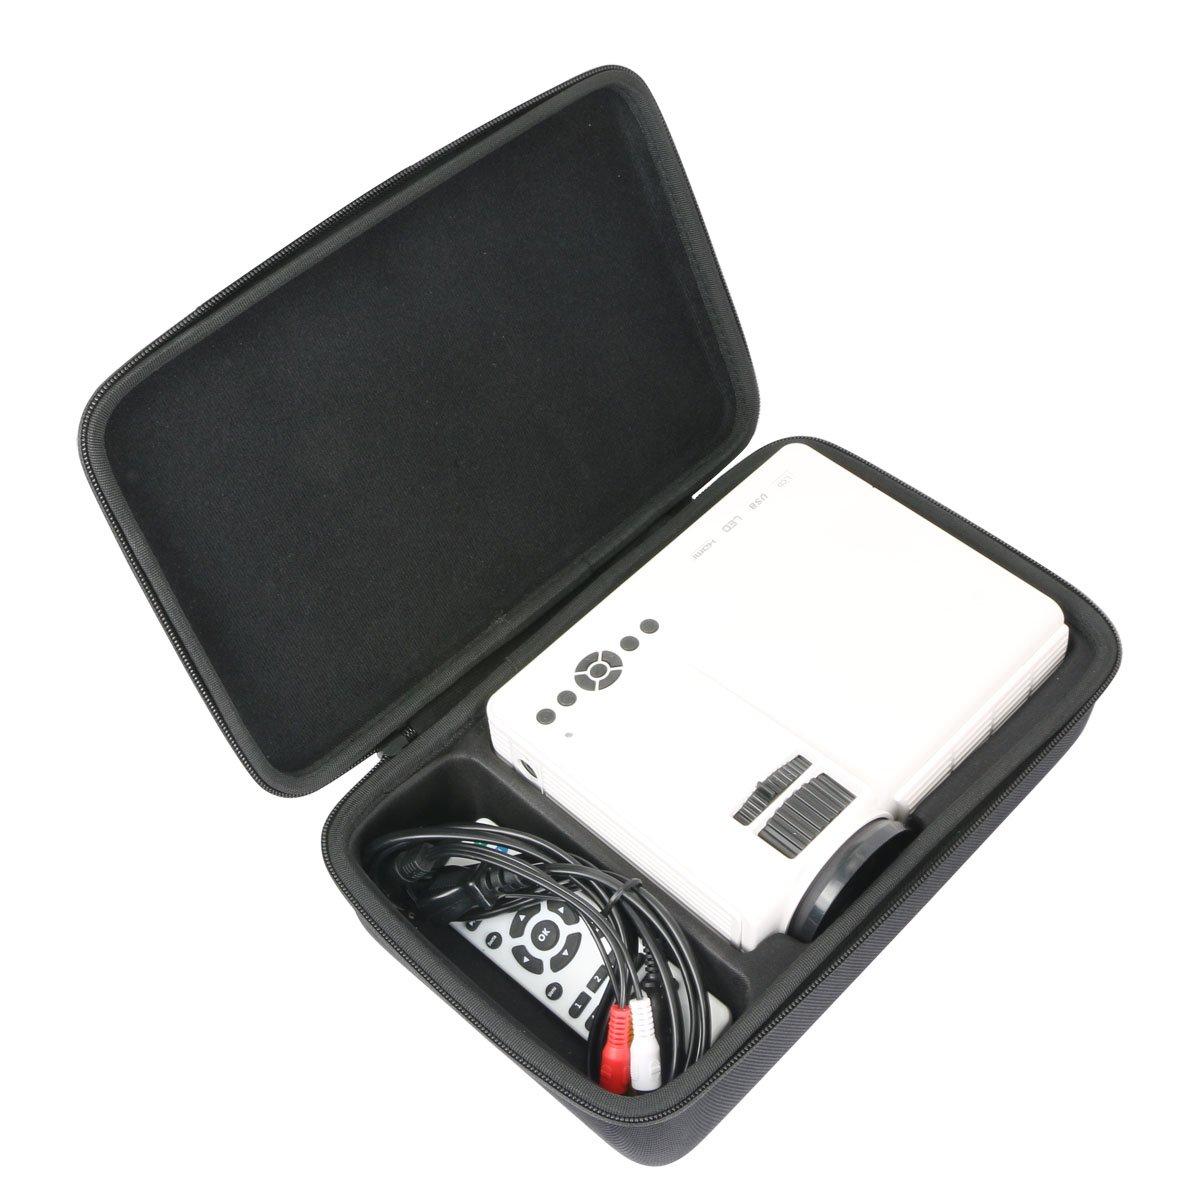 para DBPOWER Proyector portátil LED RD-810 de 1200 lúmenes ...